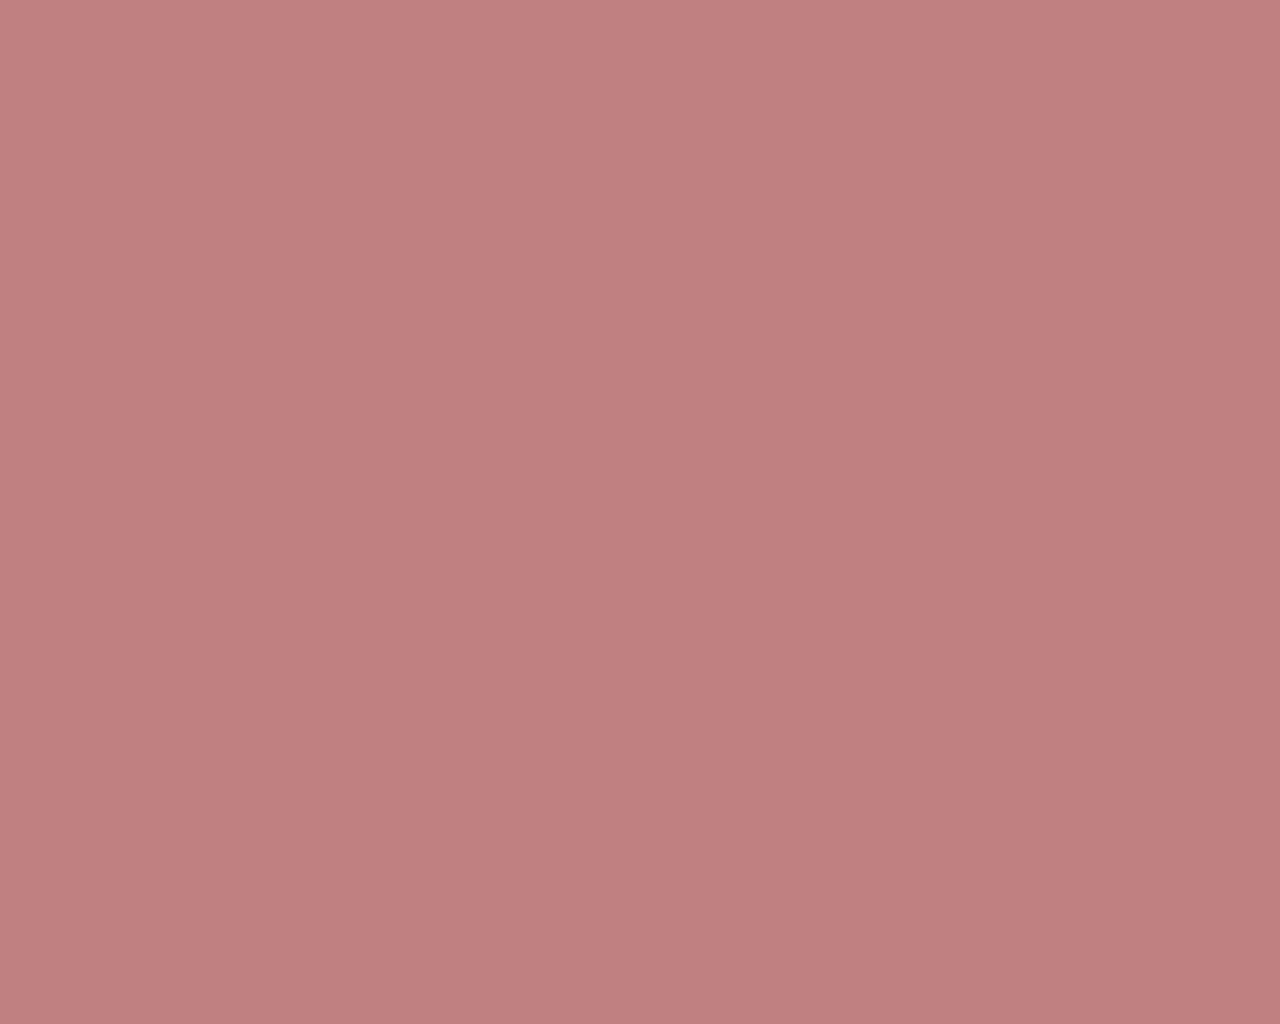 1280x1024 Old Rose Solid Color Background